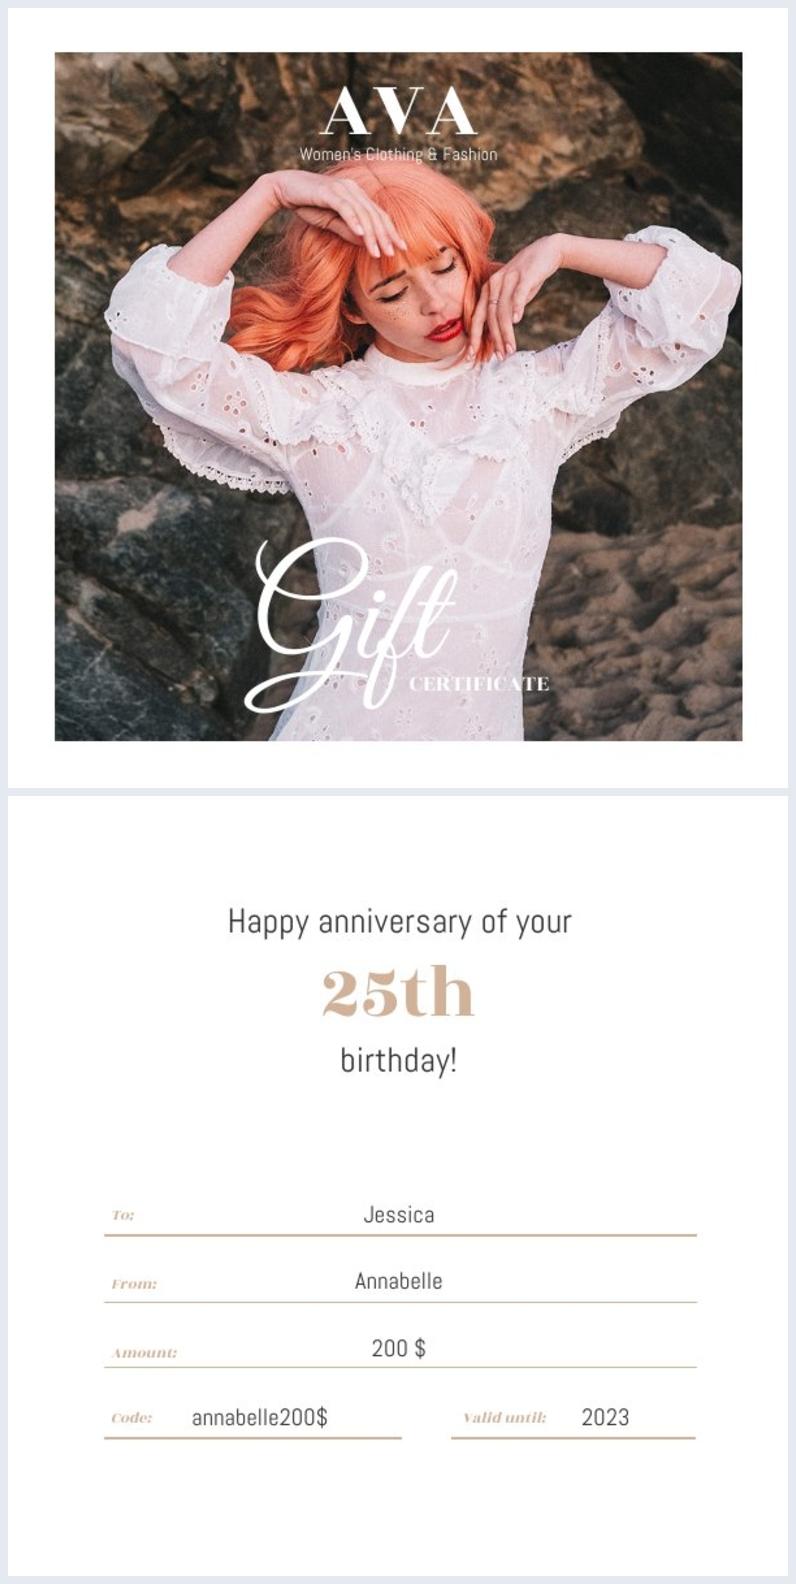 Gift certificate design for fashion company